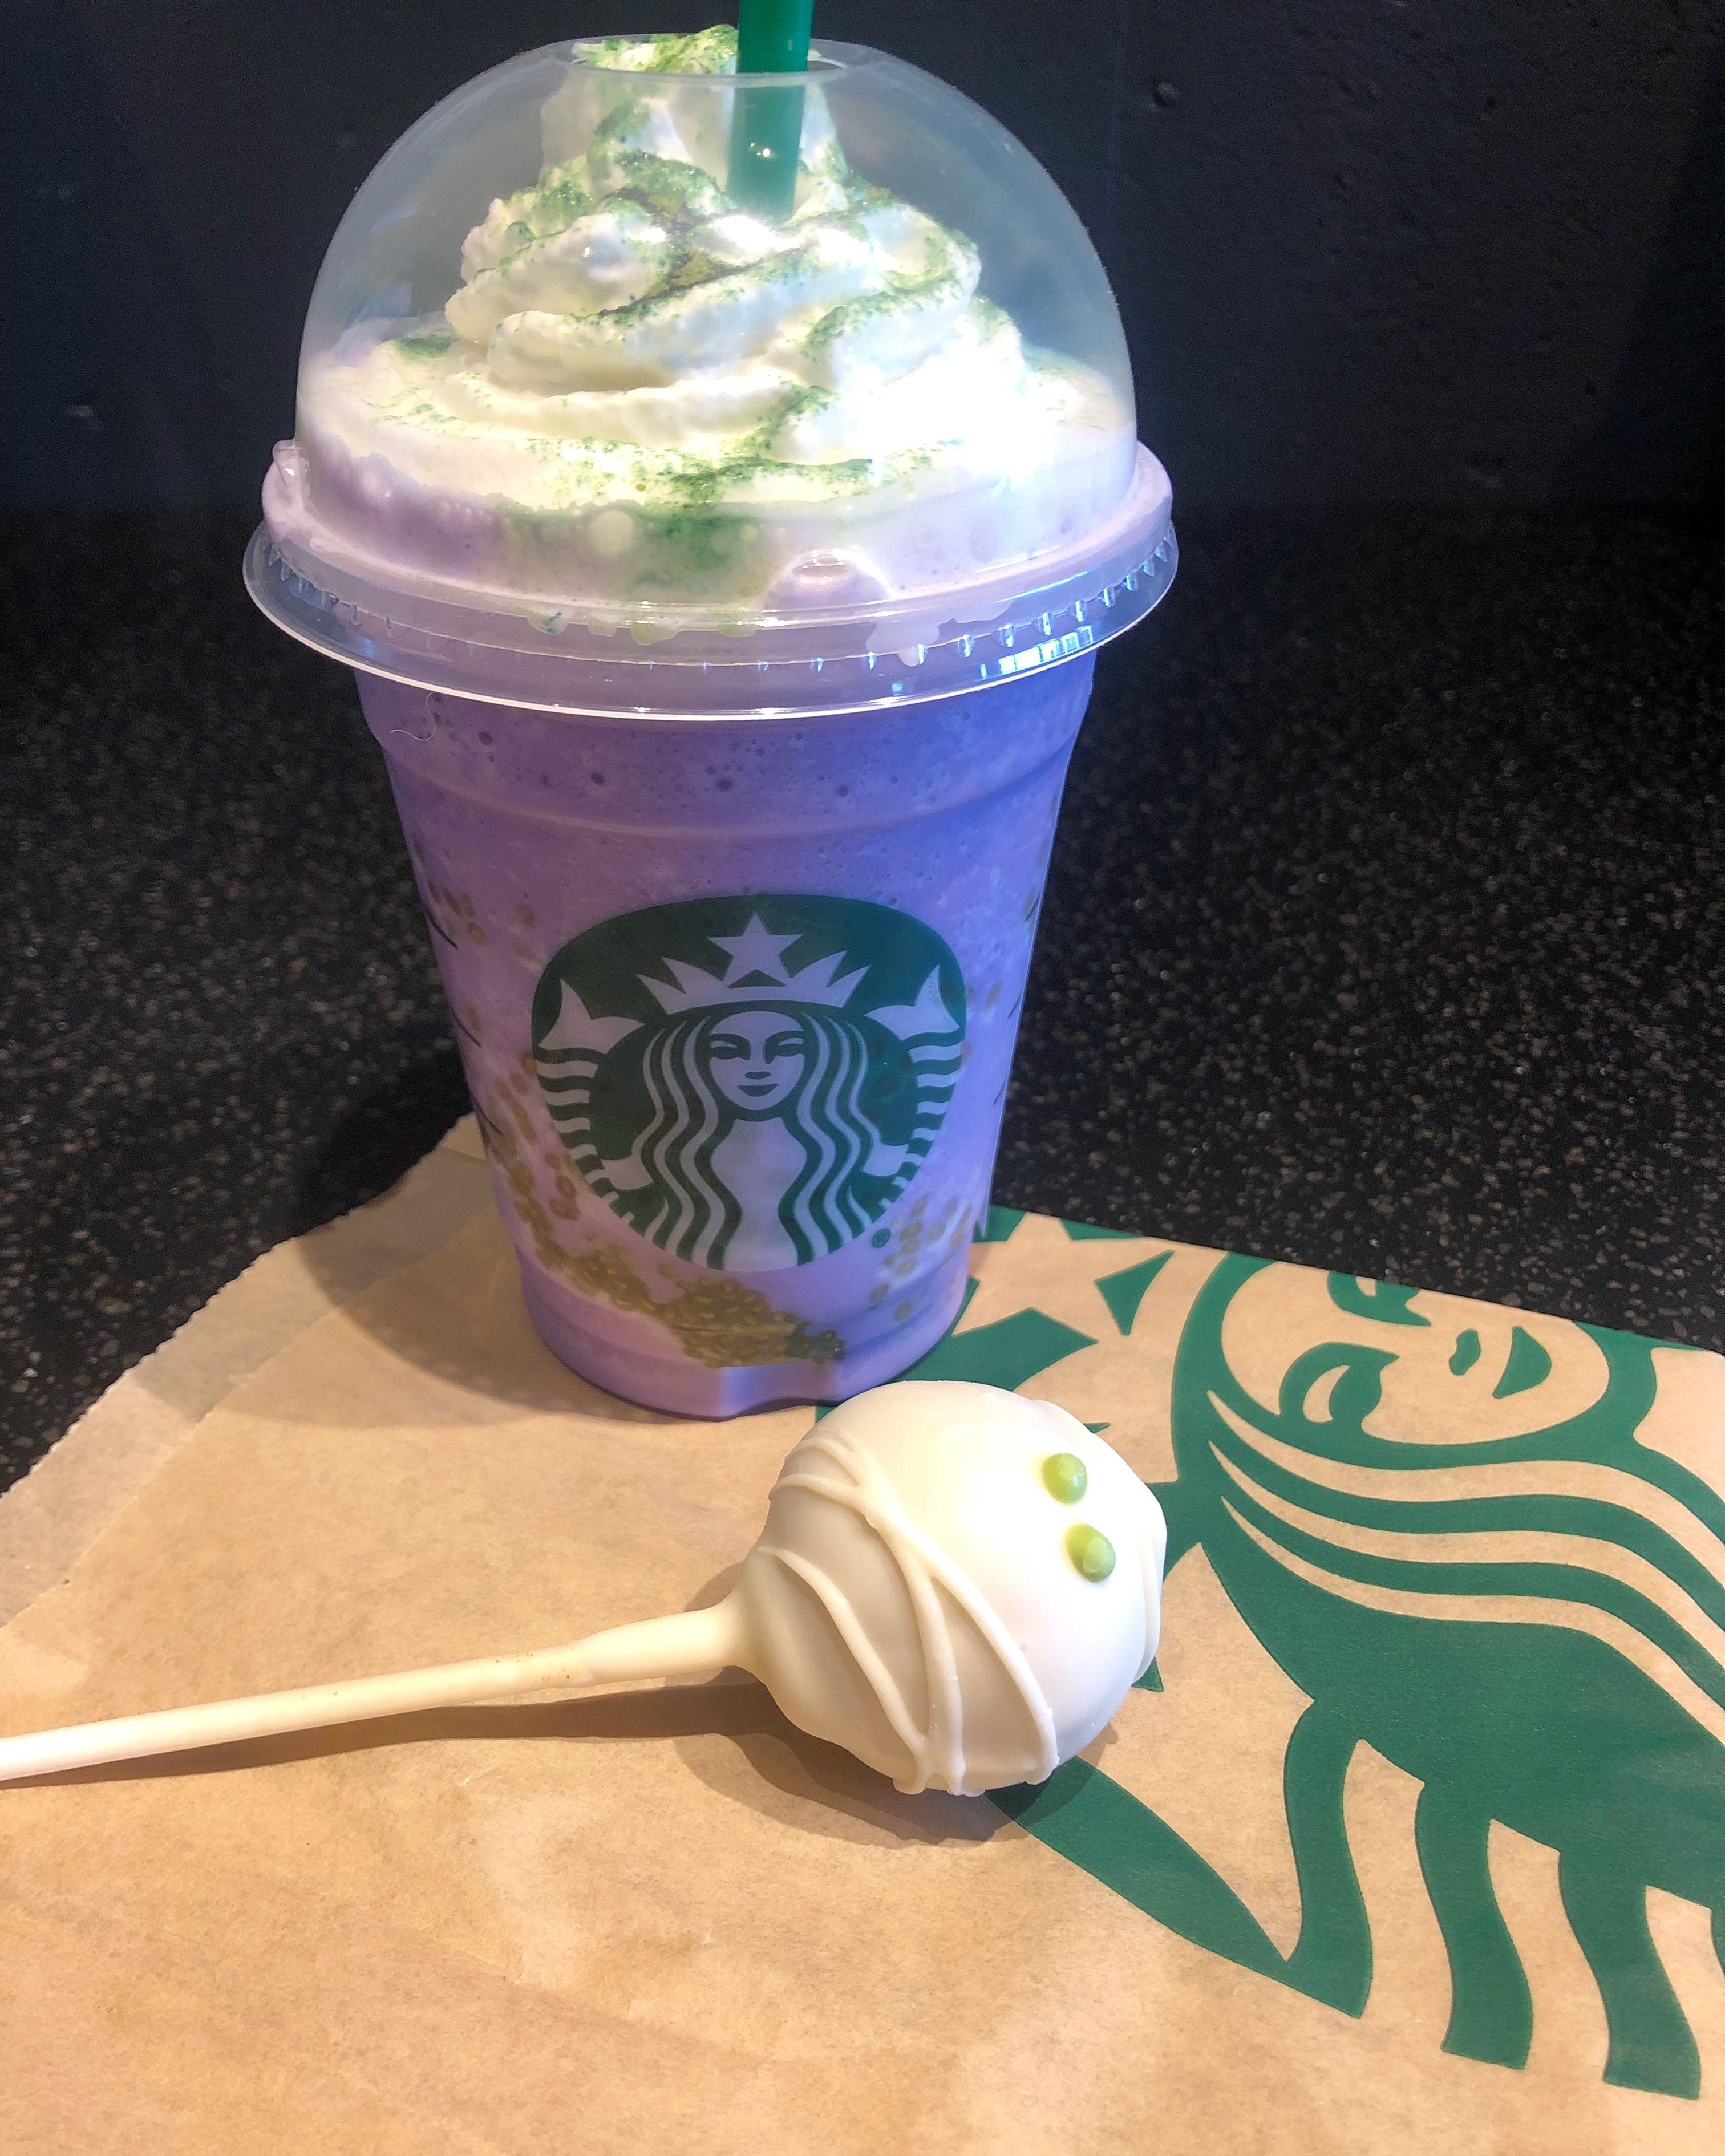 Terrific Starbucks Halloween Cake Pops The Cake Boutique Funny Birthday Cards Online Alyptdamsfinfo